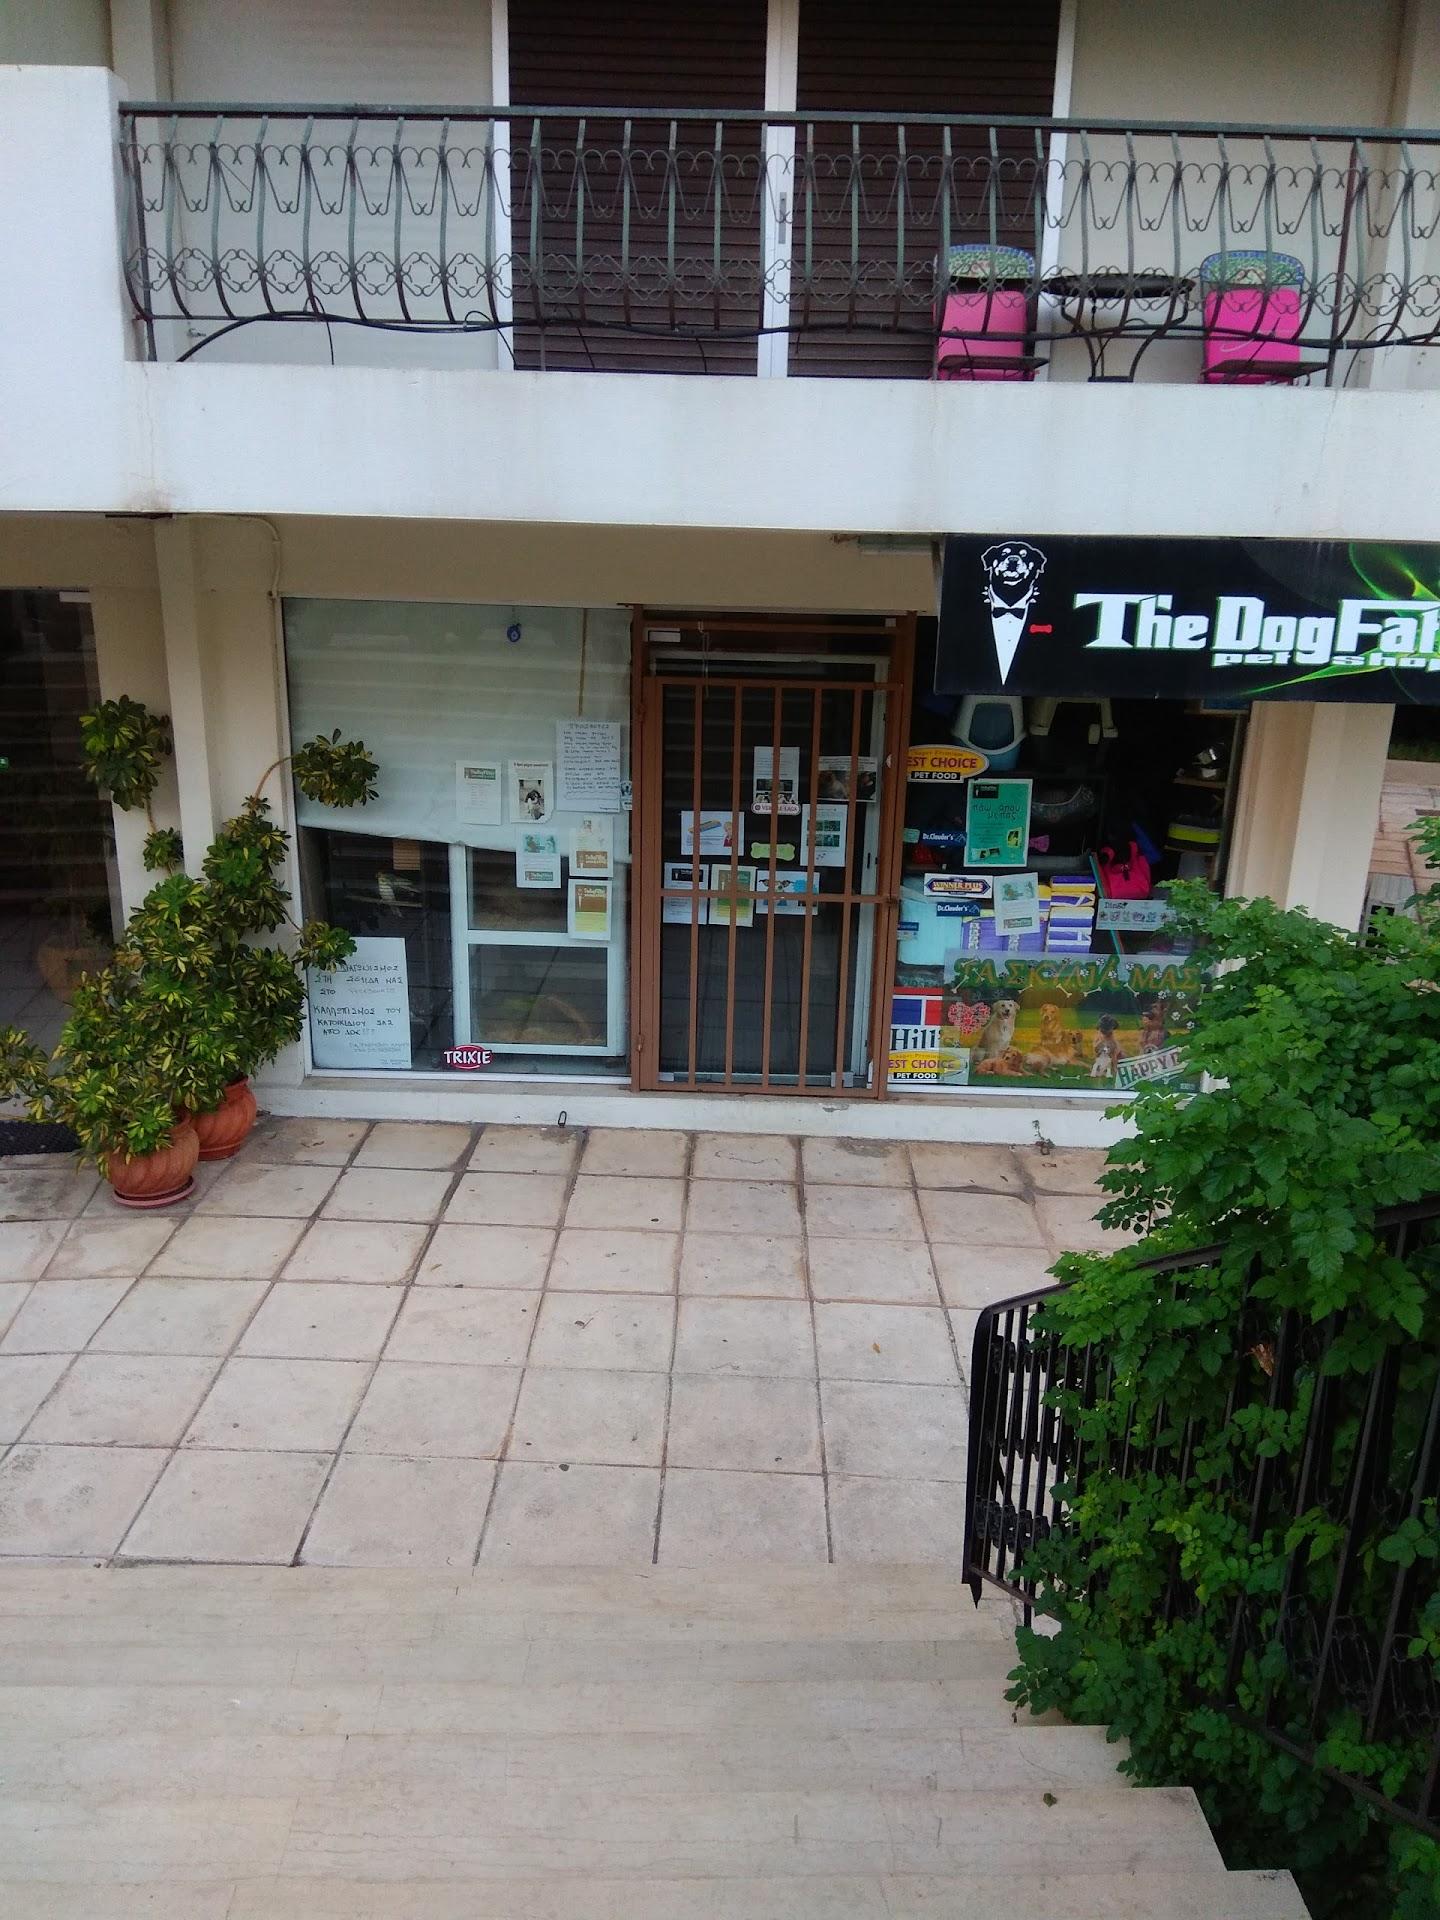 9e689e0694d8 The dogfather pet shop - Κατάστημα στην τοποθεσία Παλαιό Φάληρο